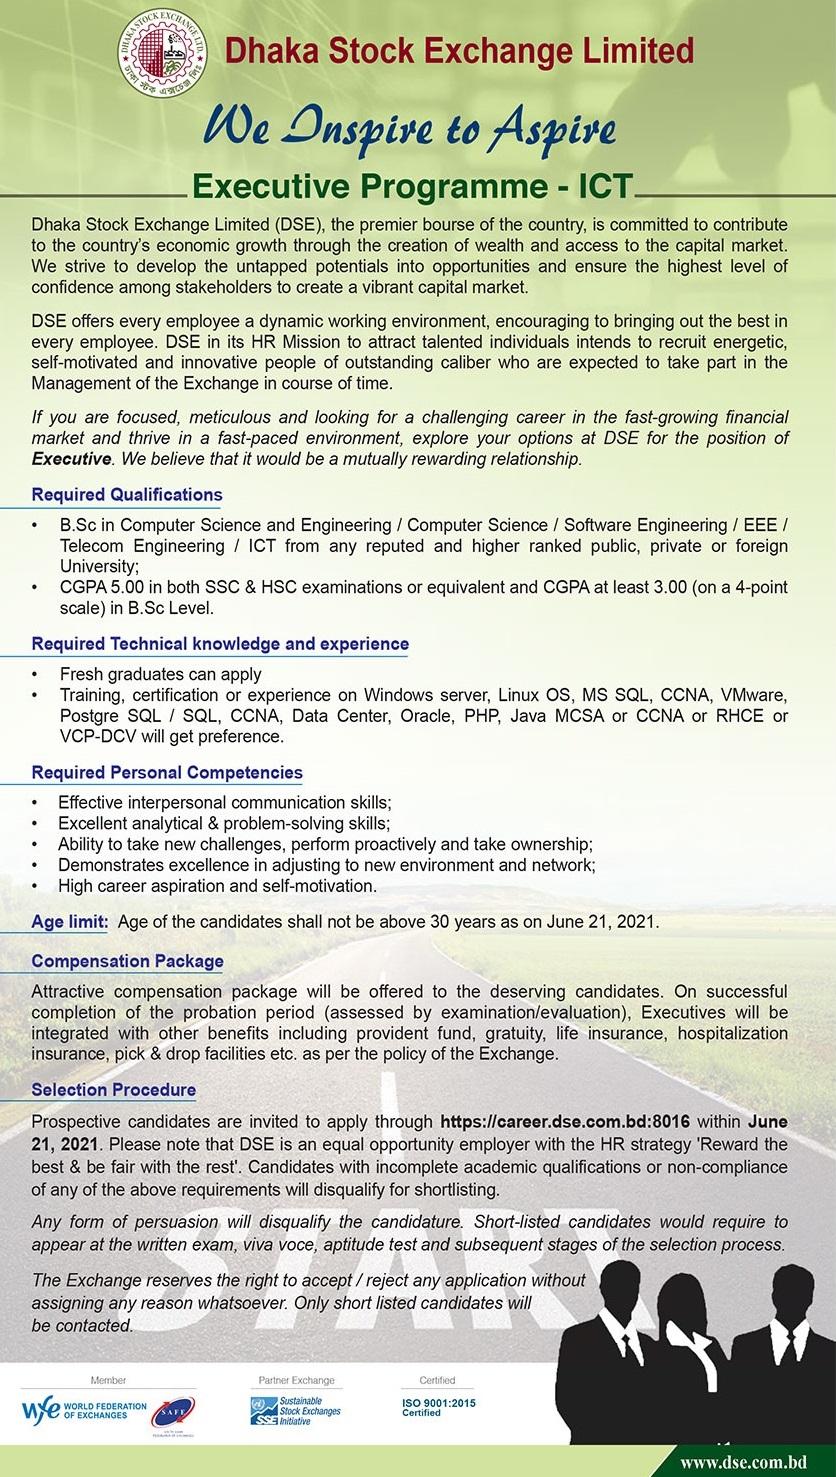 Dhaka Stock Exchange Limited Job Circular June 2021